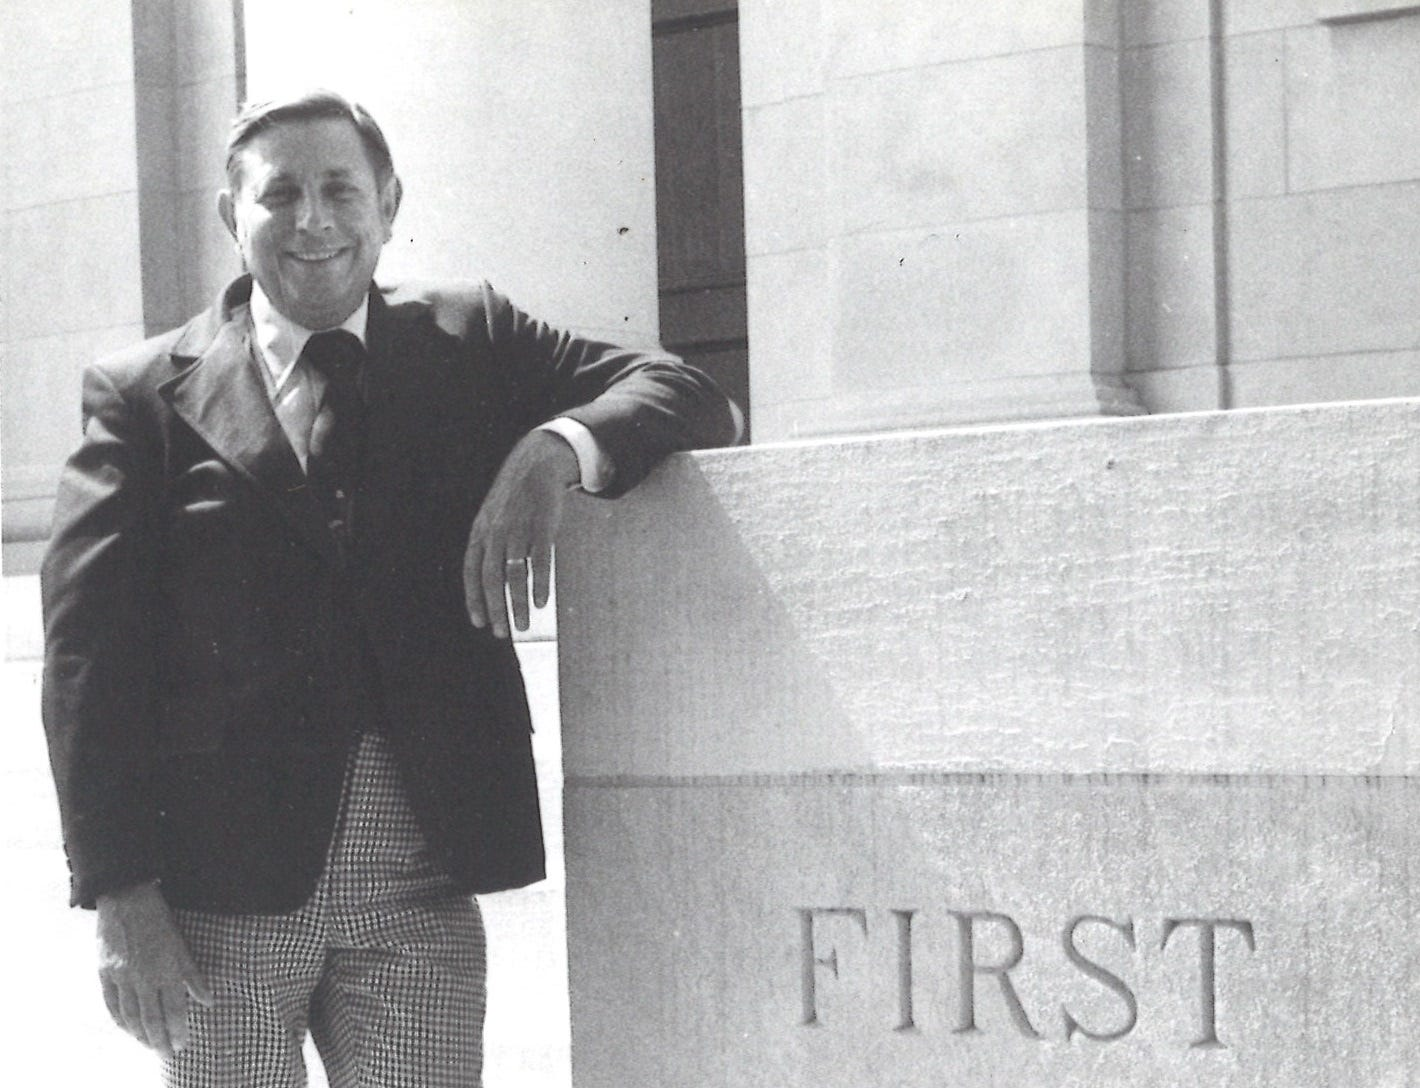 Pastor John Laida at First Baptist Church.